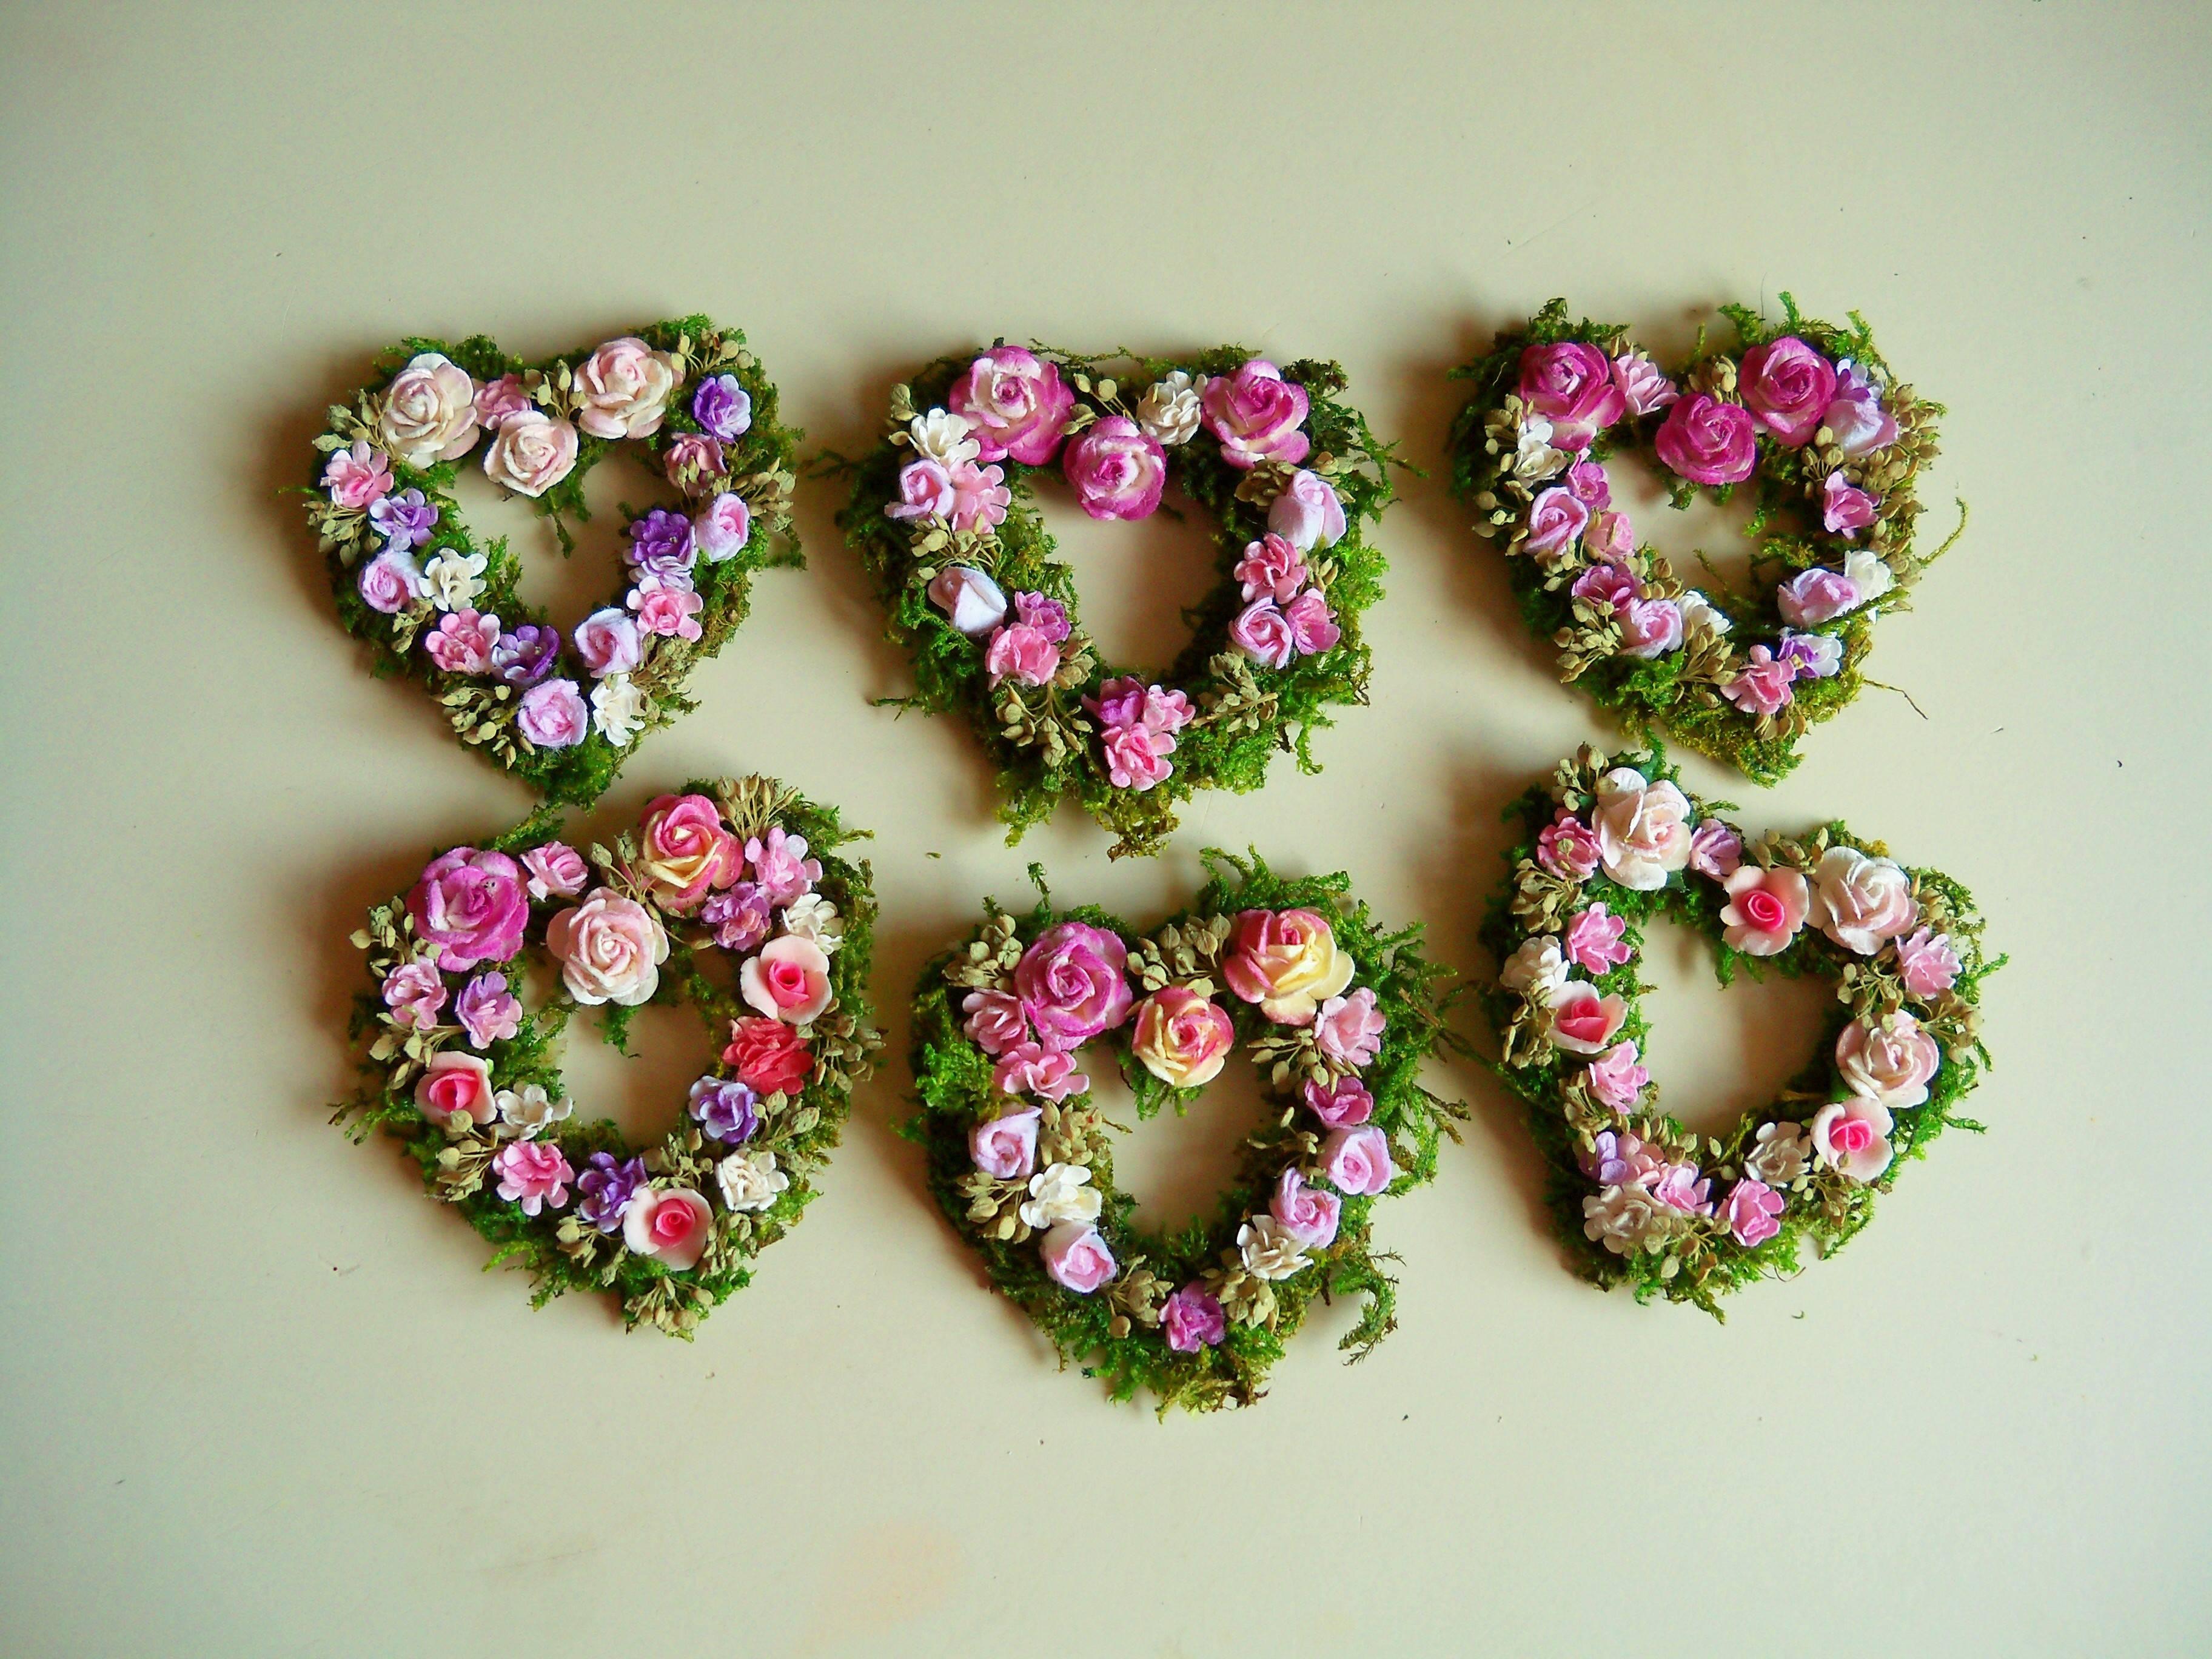 Floral heart wreaths